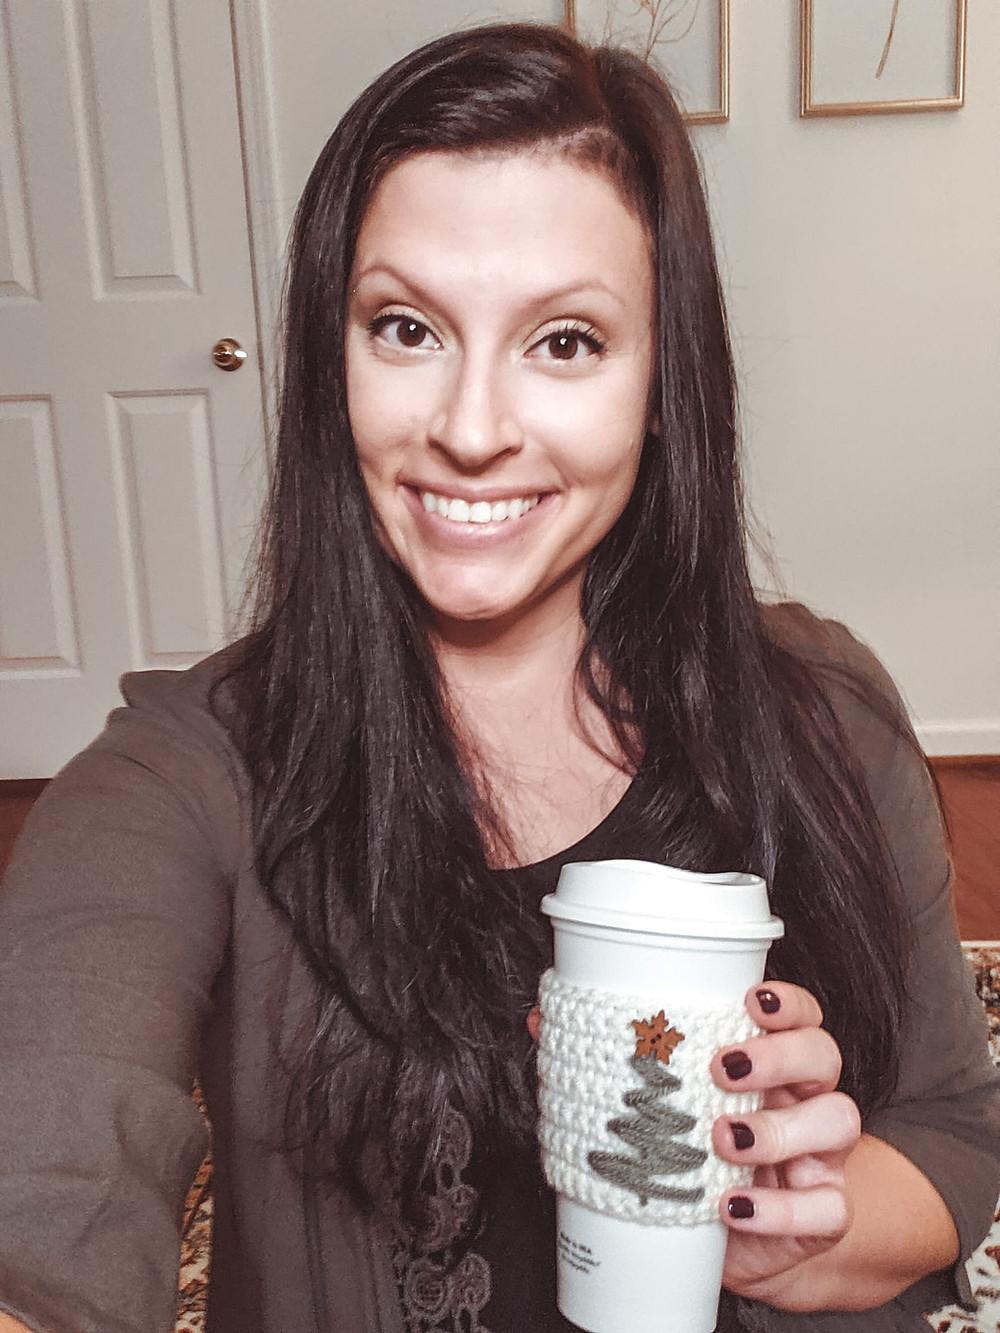 Me holding the Crochet Christmas Tree Cozy with my coffee mug.